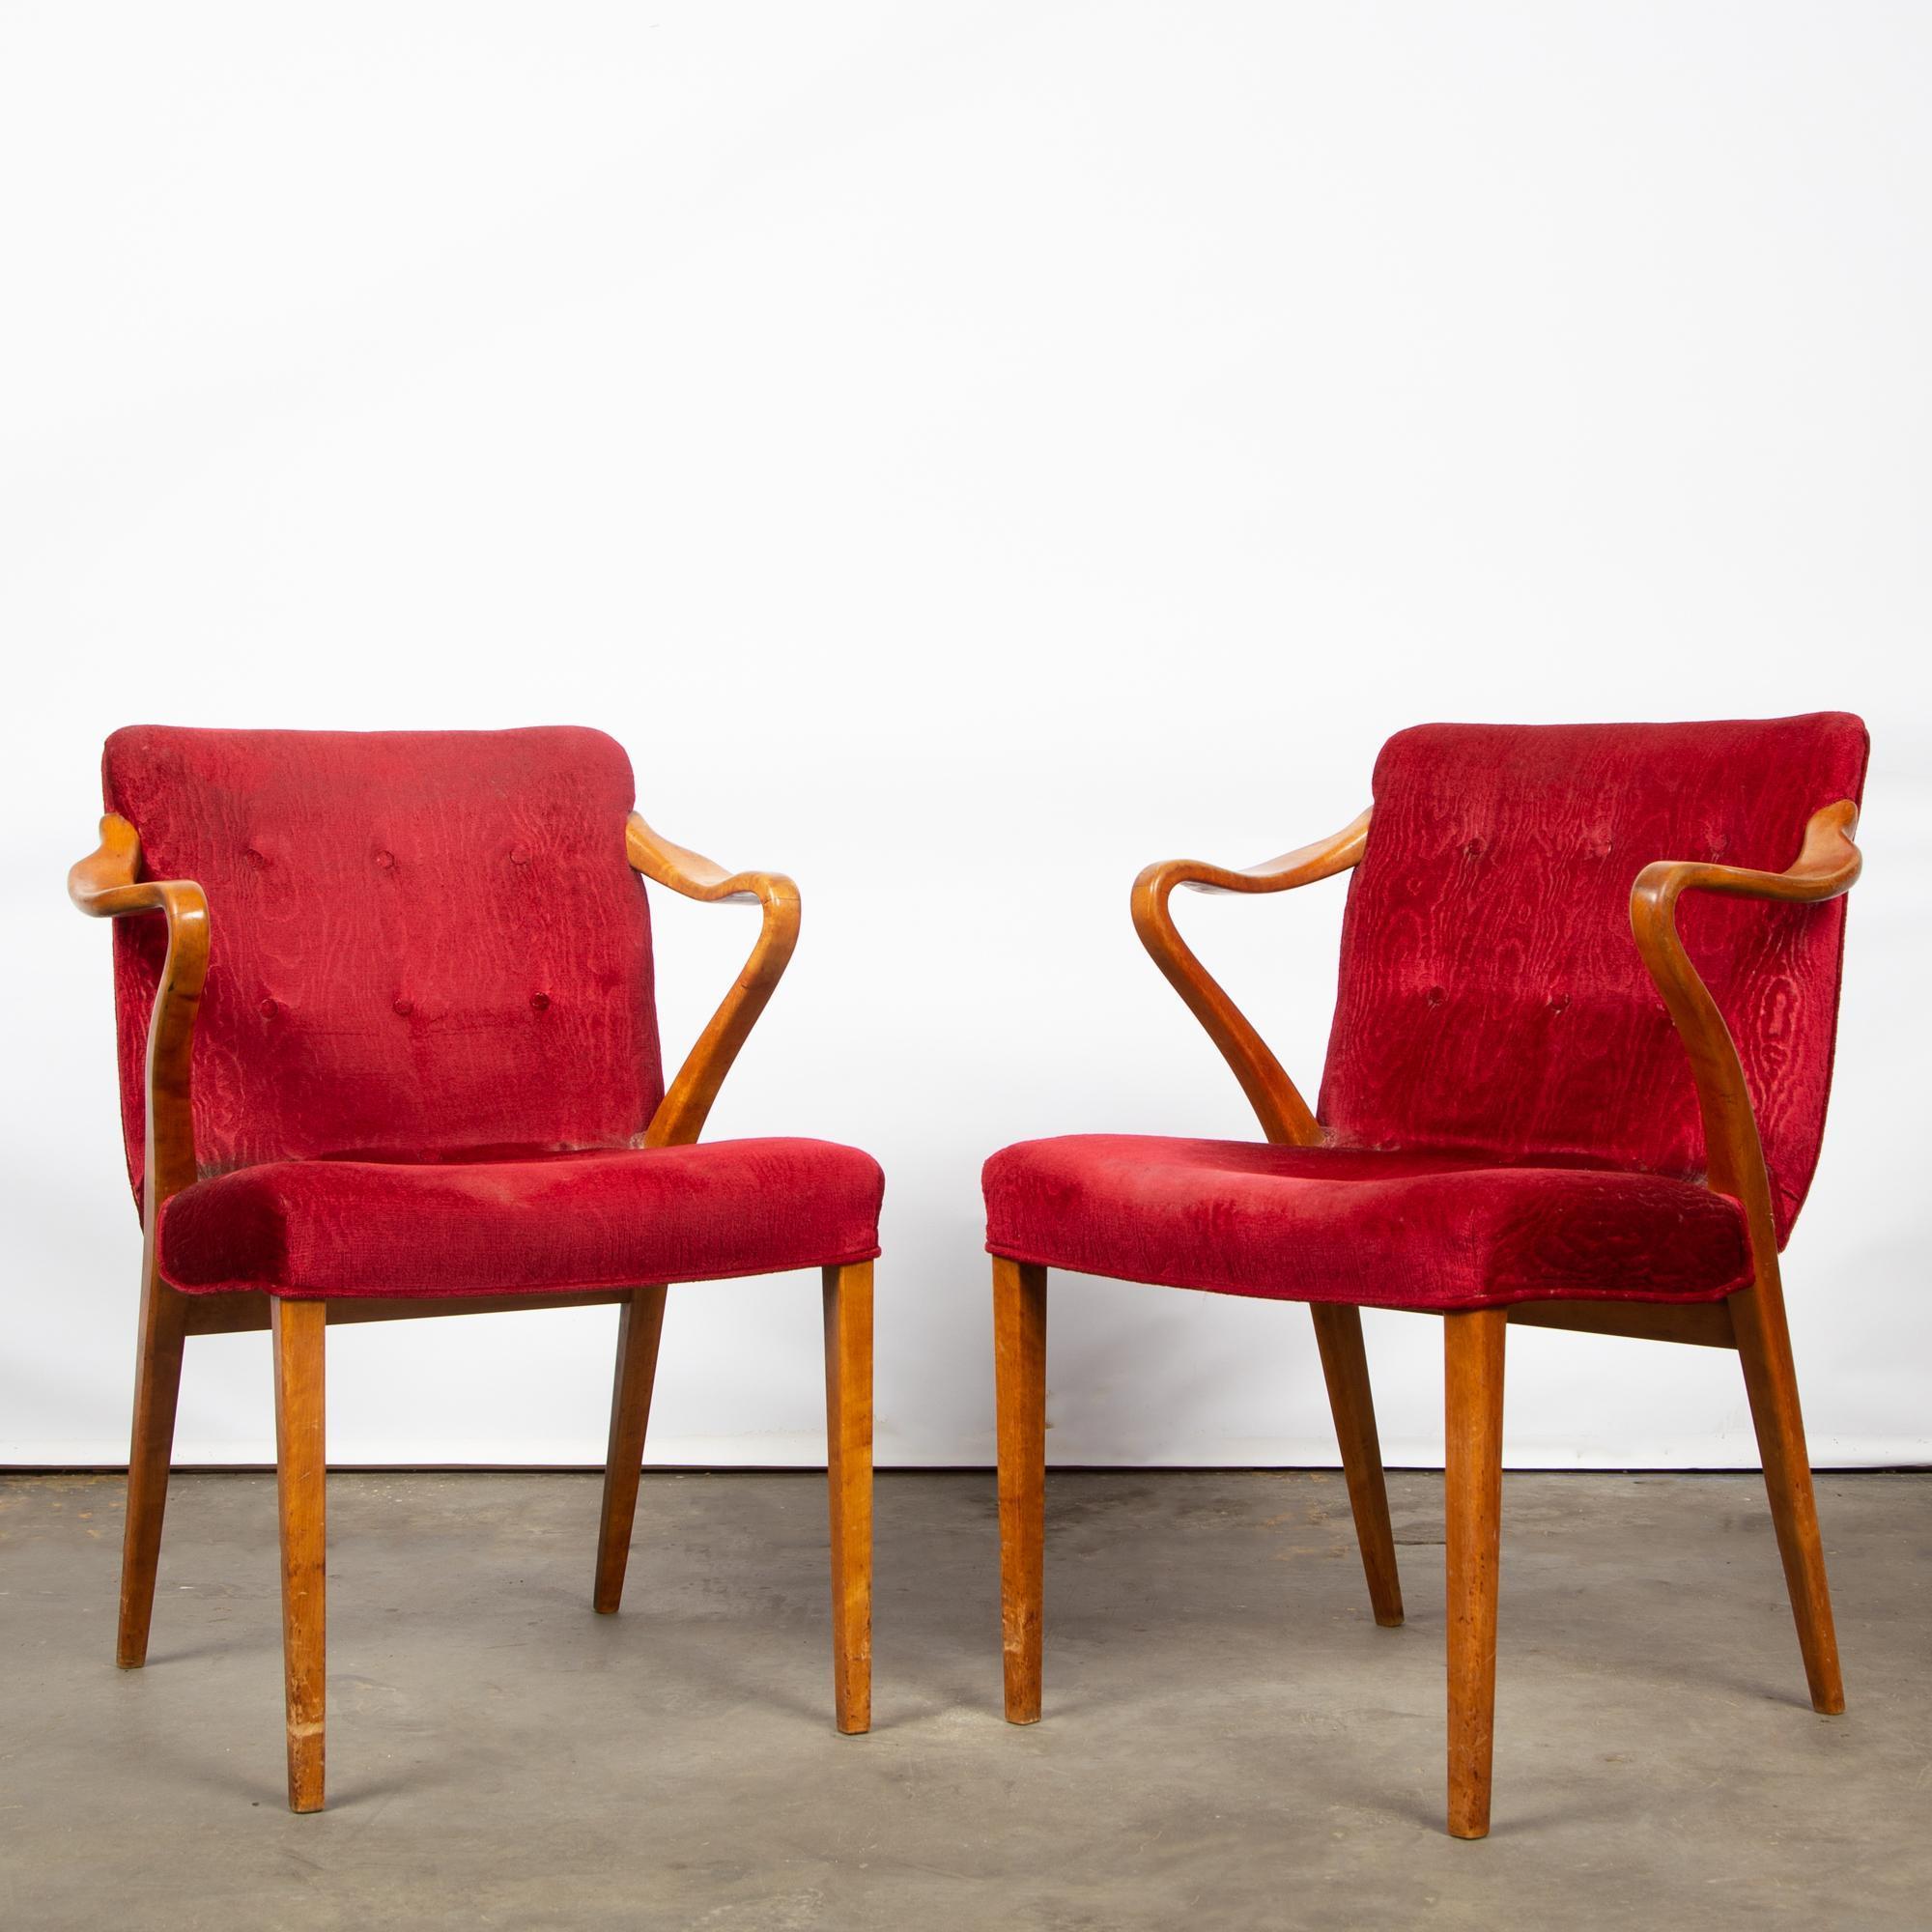 Miraculous Pair Of Modern Curved Arm Chairs Inzonedesignstudio Interior Chair Design Inzonedesignstudiocom